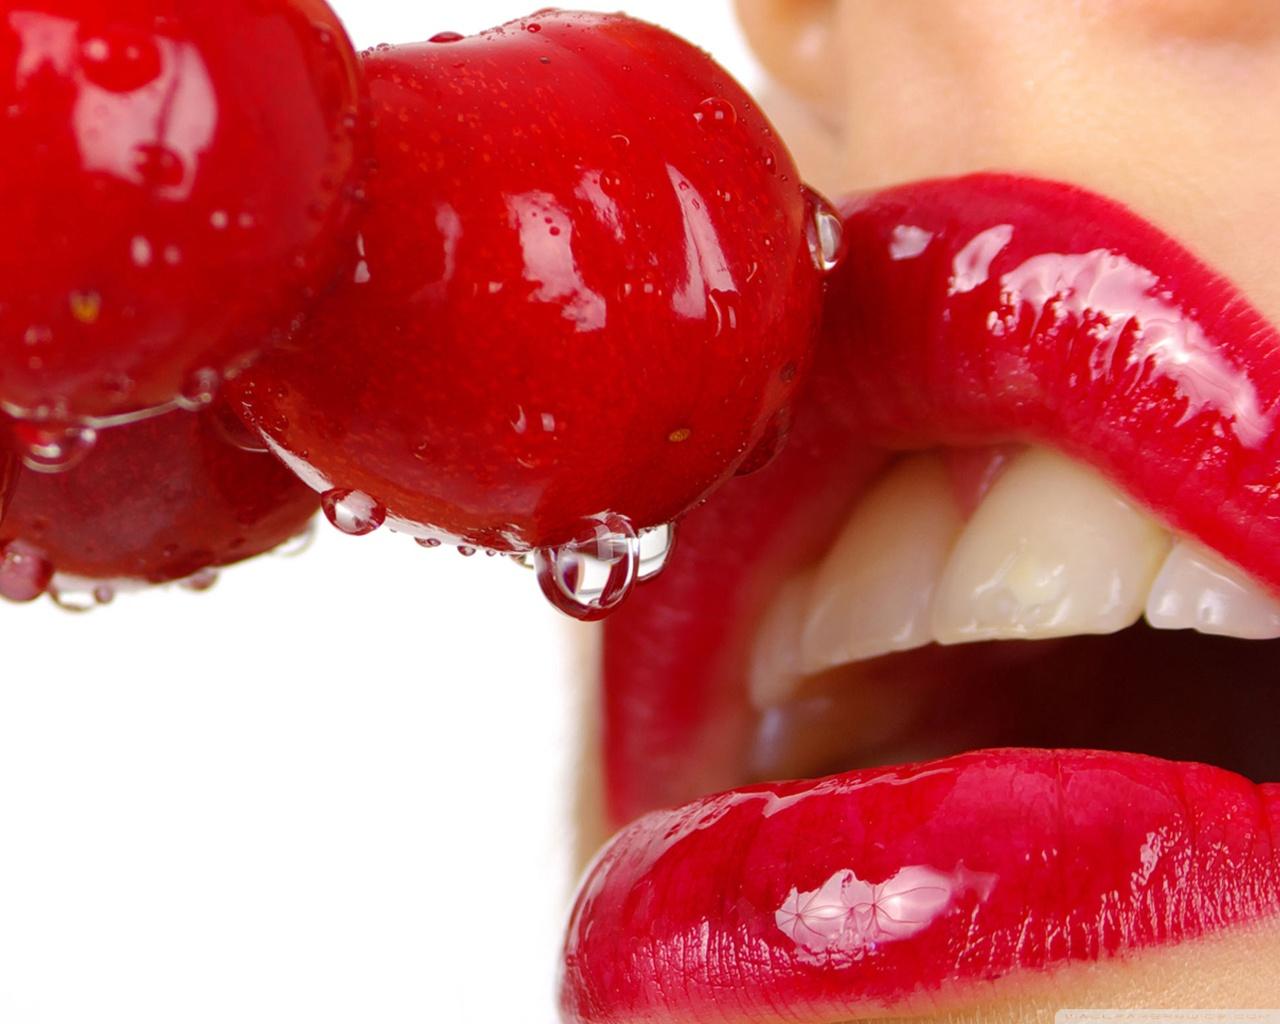 http://1.bp.blogspot.com/-DT720fxXaO8/UKAtaLipotI/AAAAAAAACZA/oHir5cxi4eo/s1600/cherry_lips-wallpaper-1280x1024.jpg